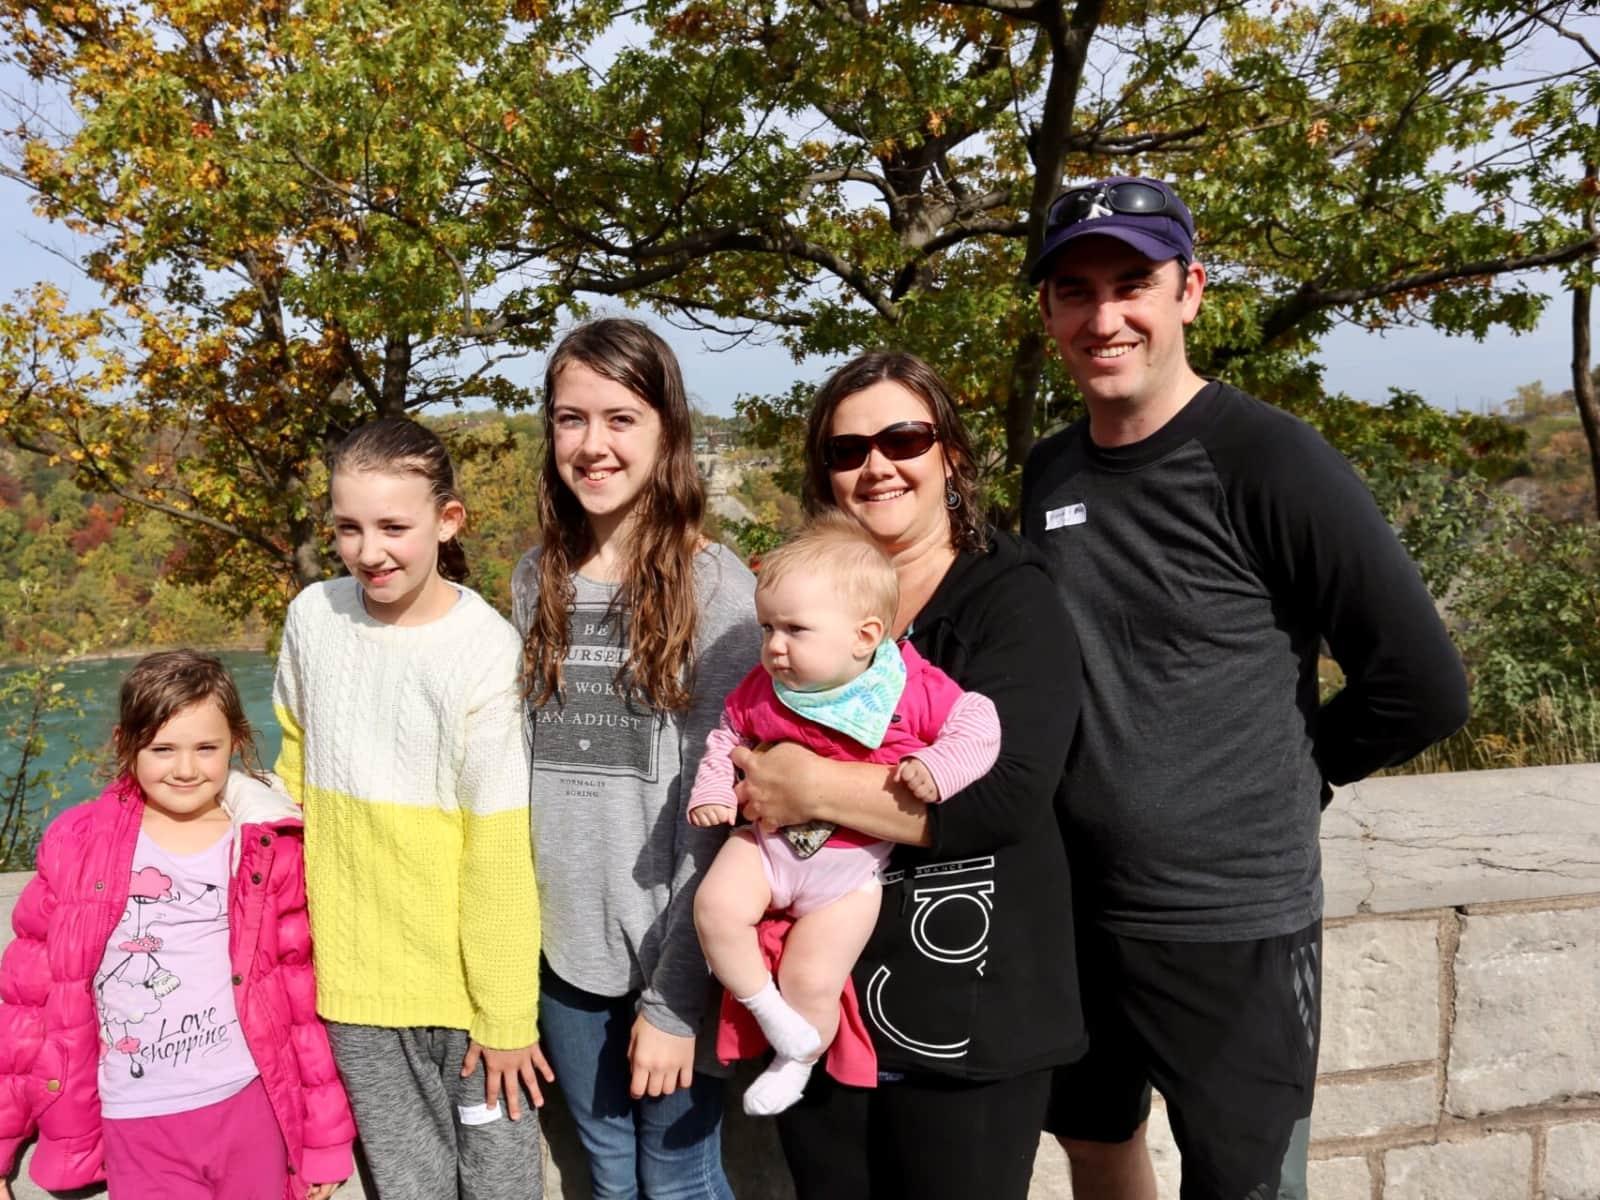 Kristine & Stephen from Etobicoke, Ontario, Canada